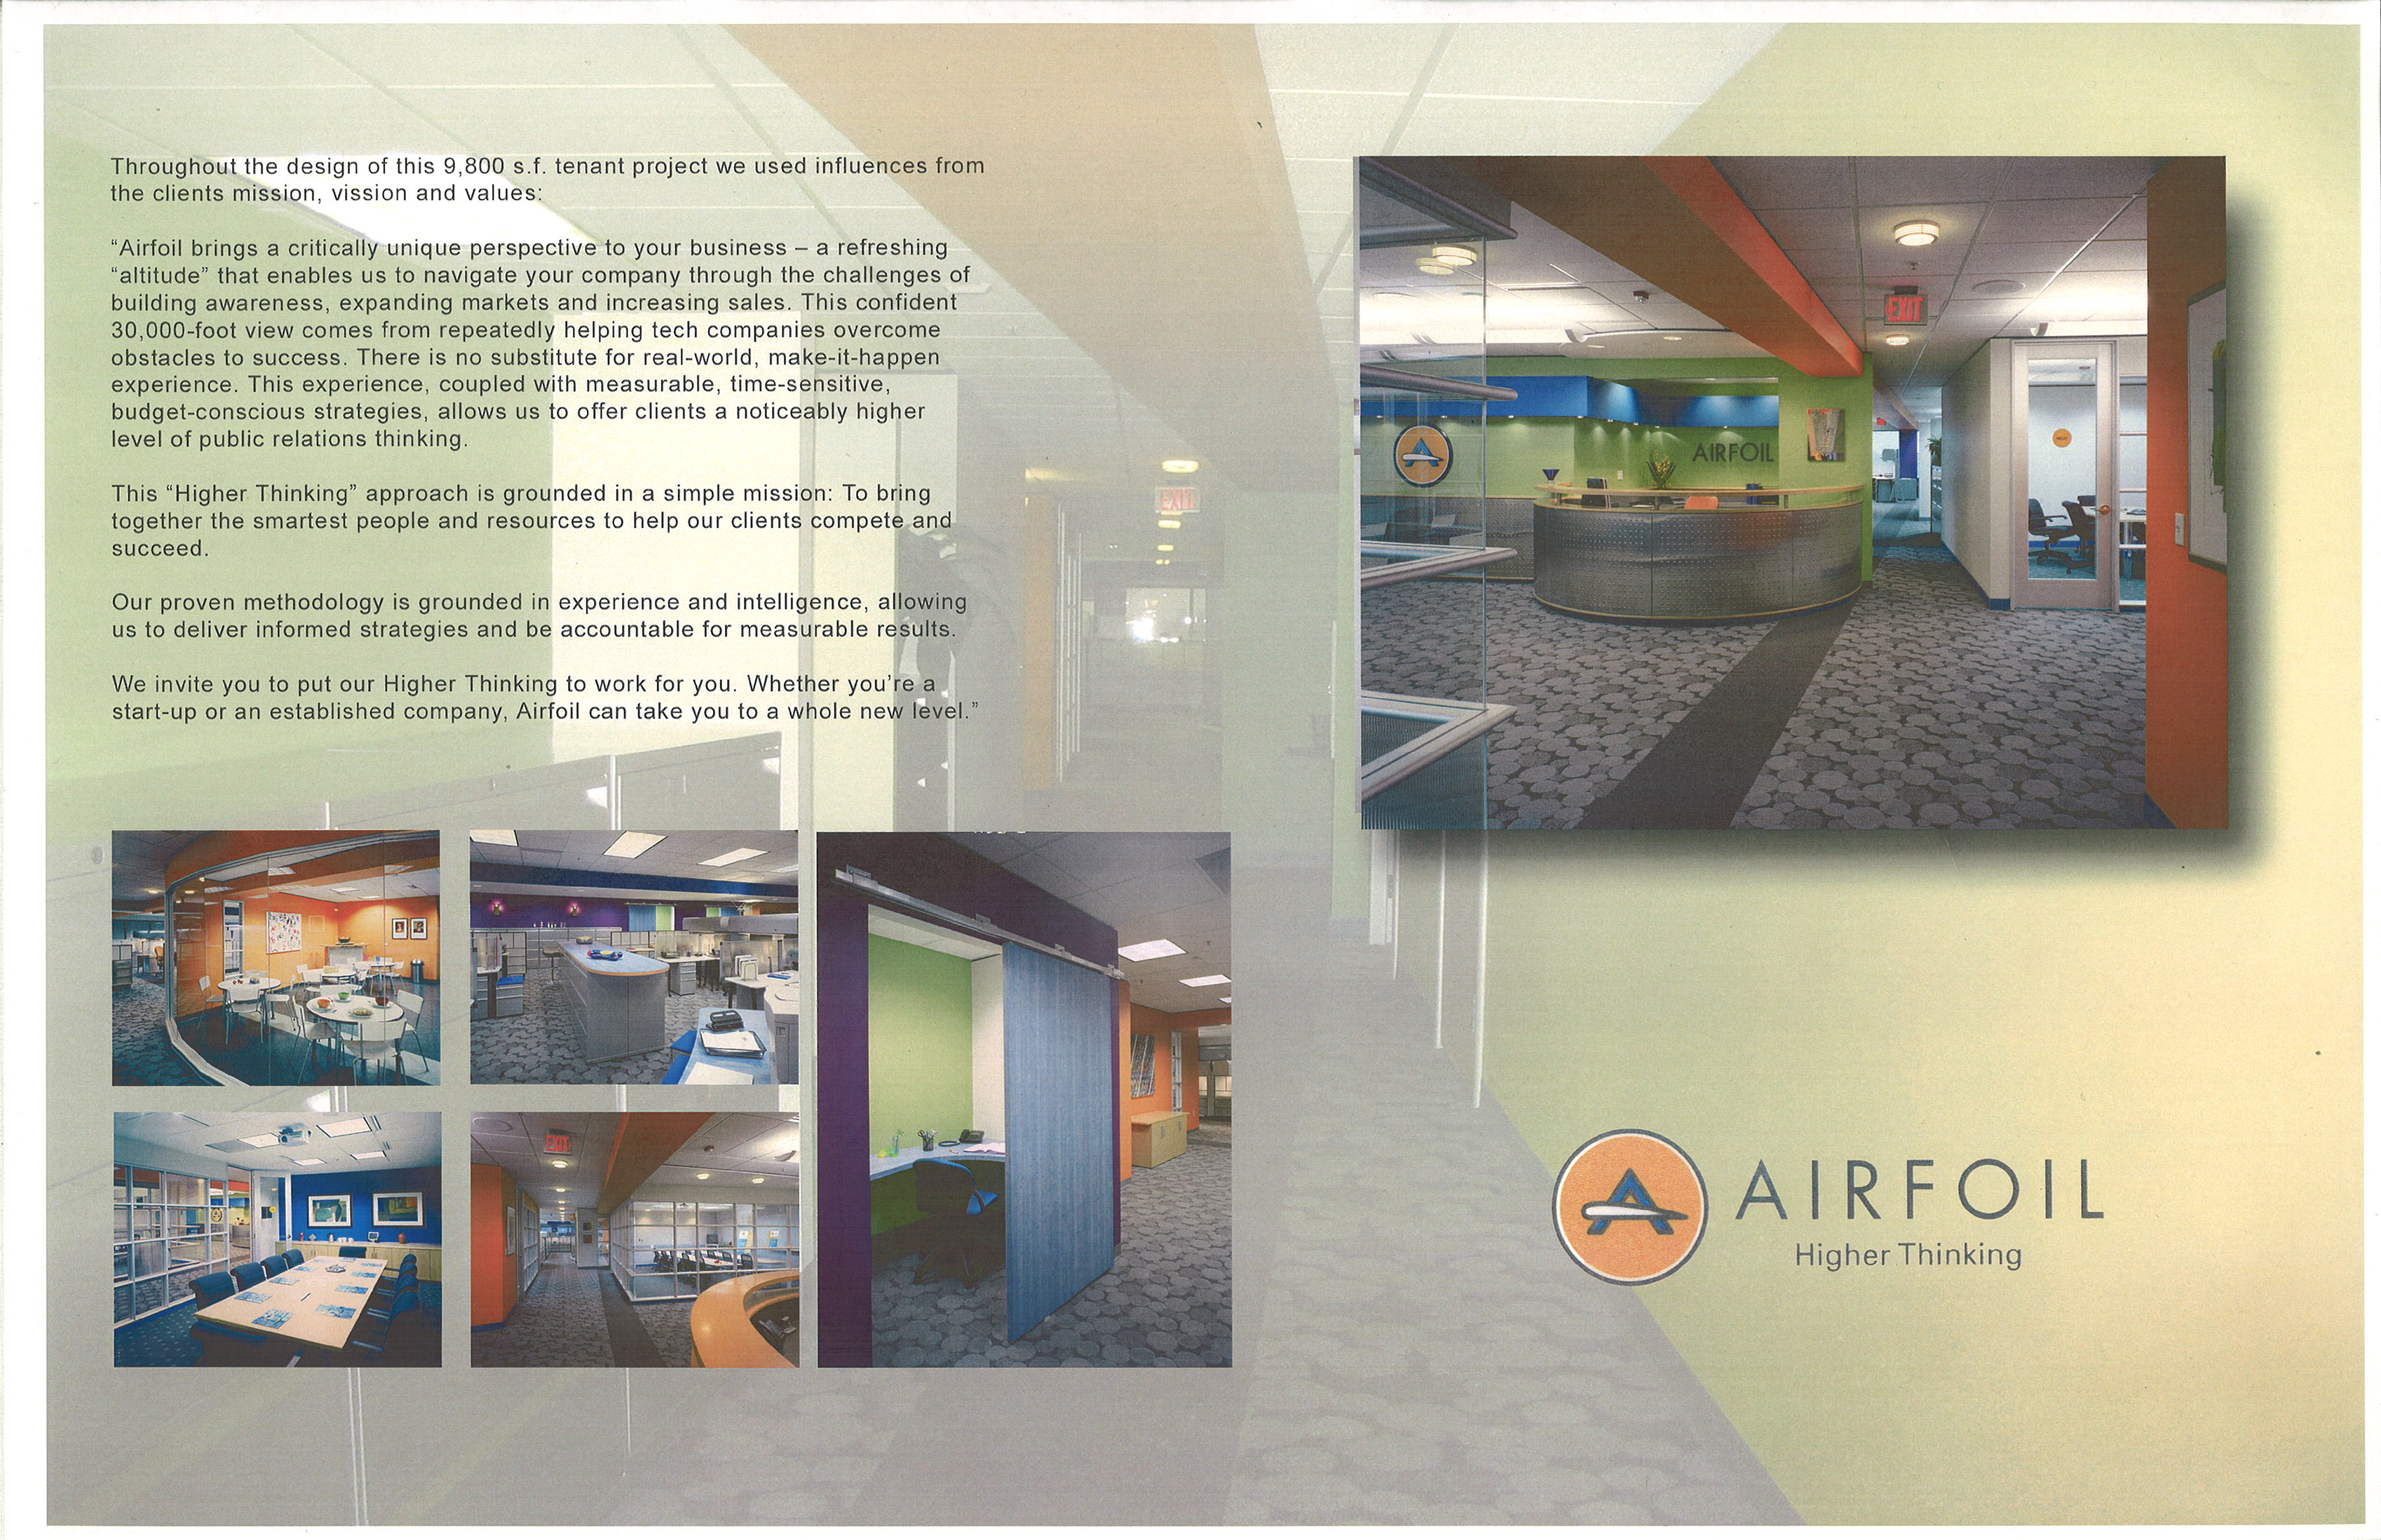 Sample of my professional interior design portfolio images from the